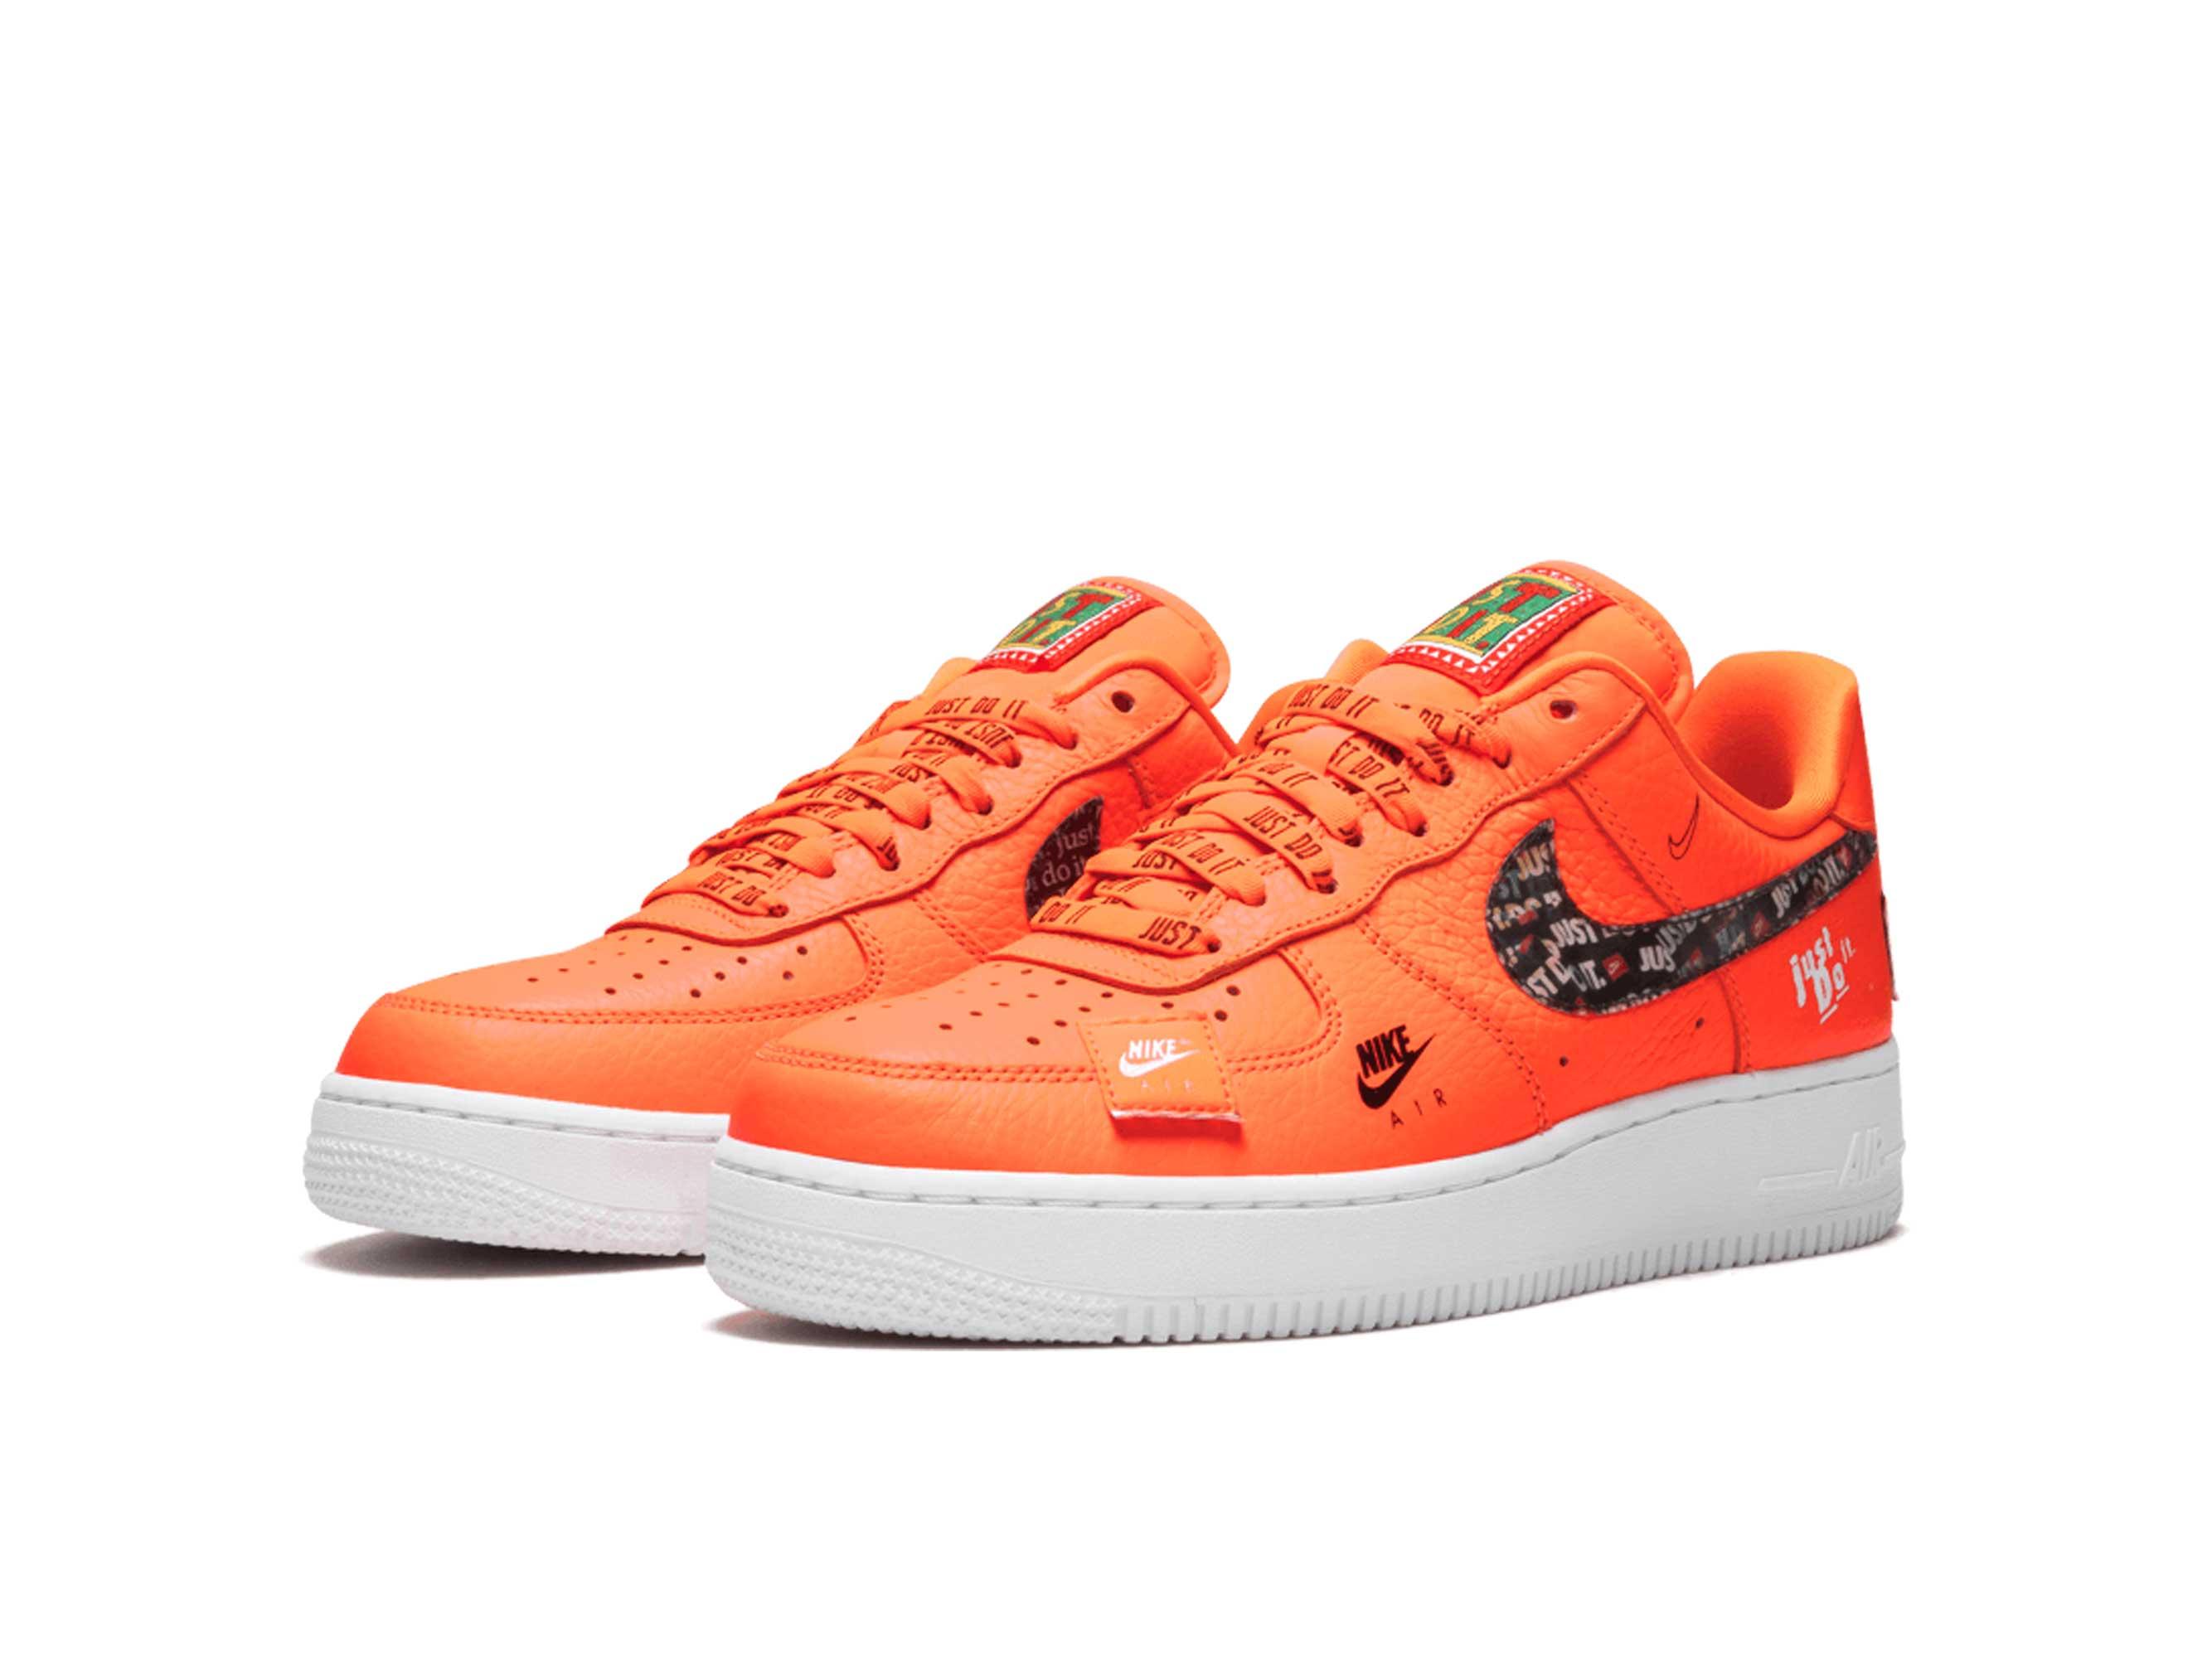 nike air force 1 07 orange AR7719_800 купить